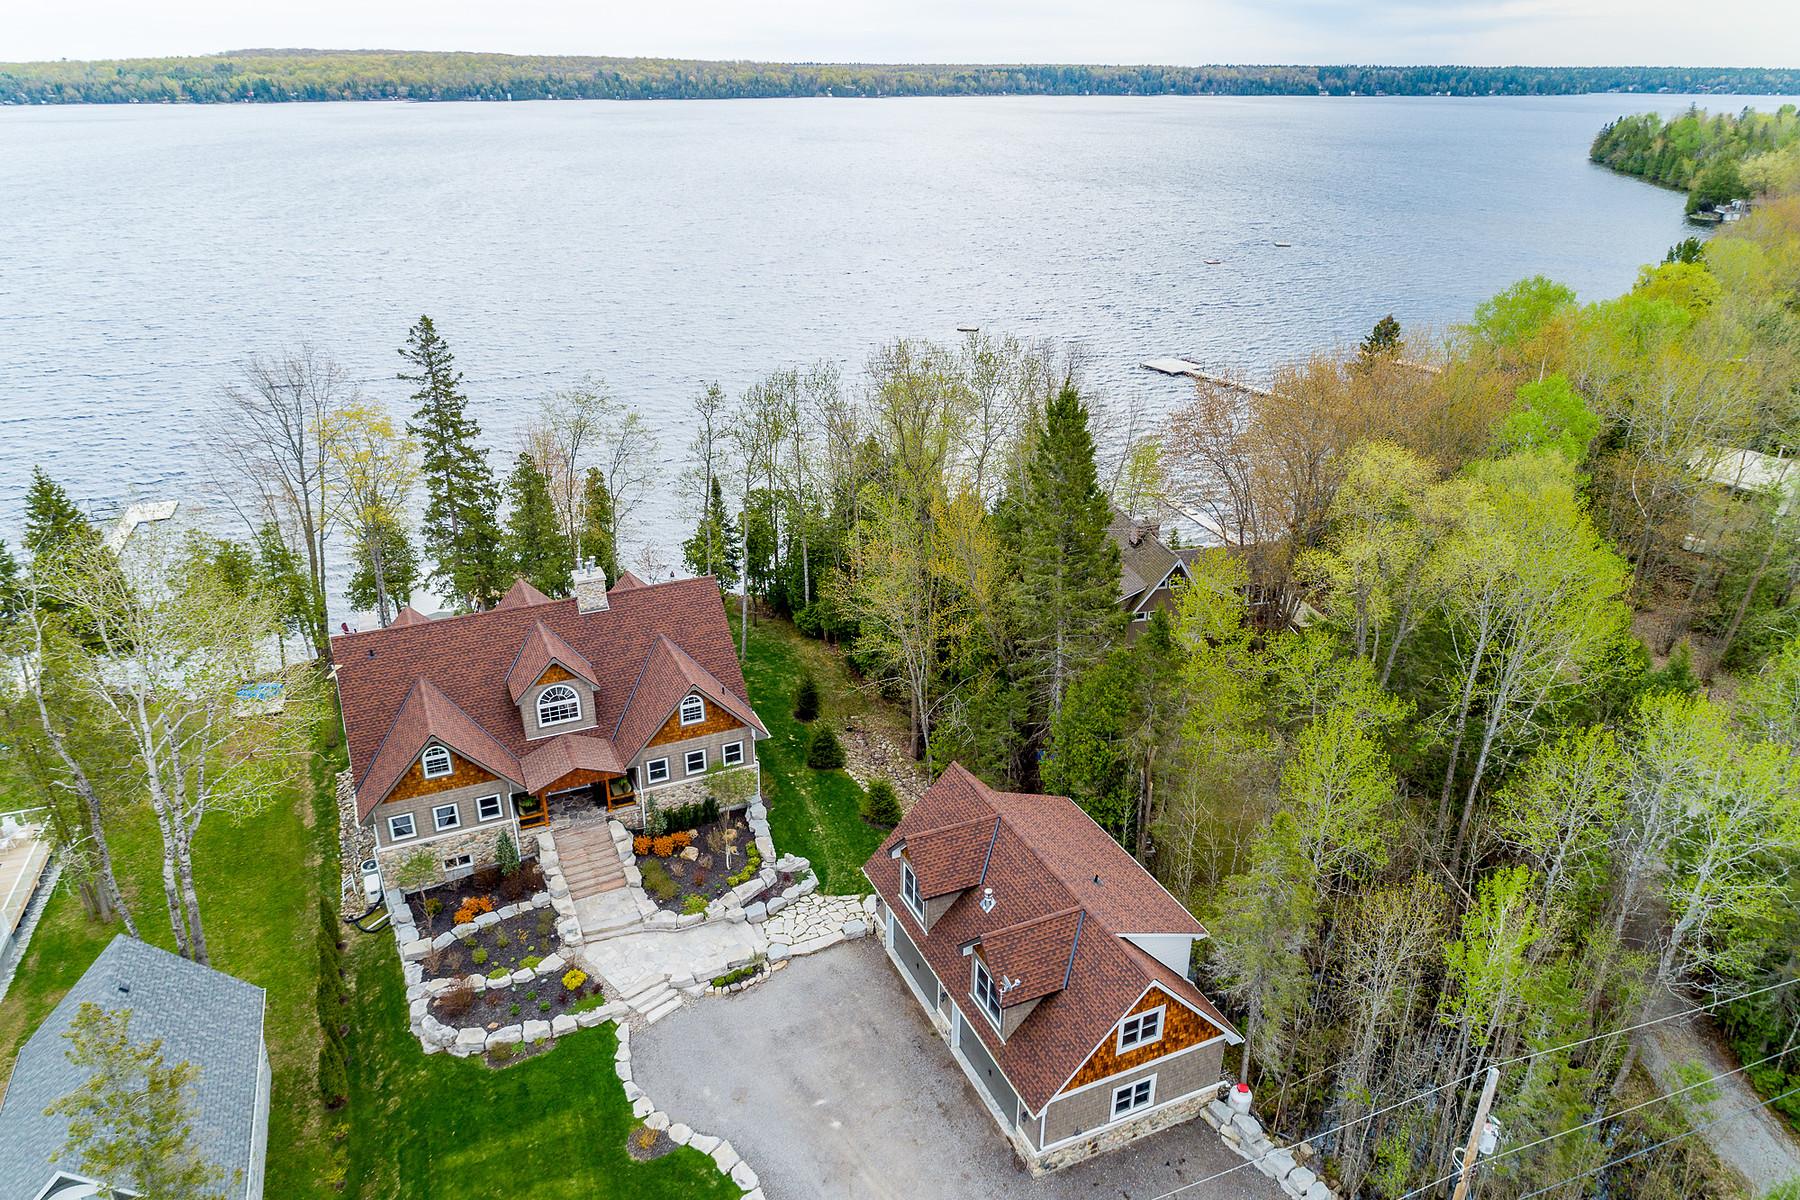 Single Family Homes for Sale at Year-round Lake Living 33 Beaver Drive Kawartha Lakes, Ontario K0M 1K0 Canada